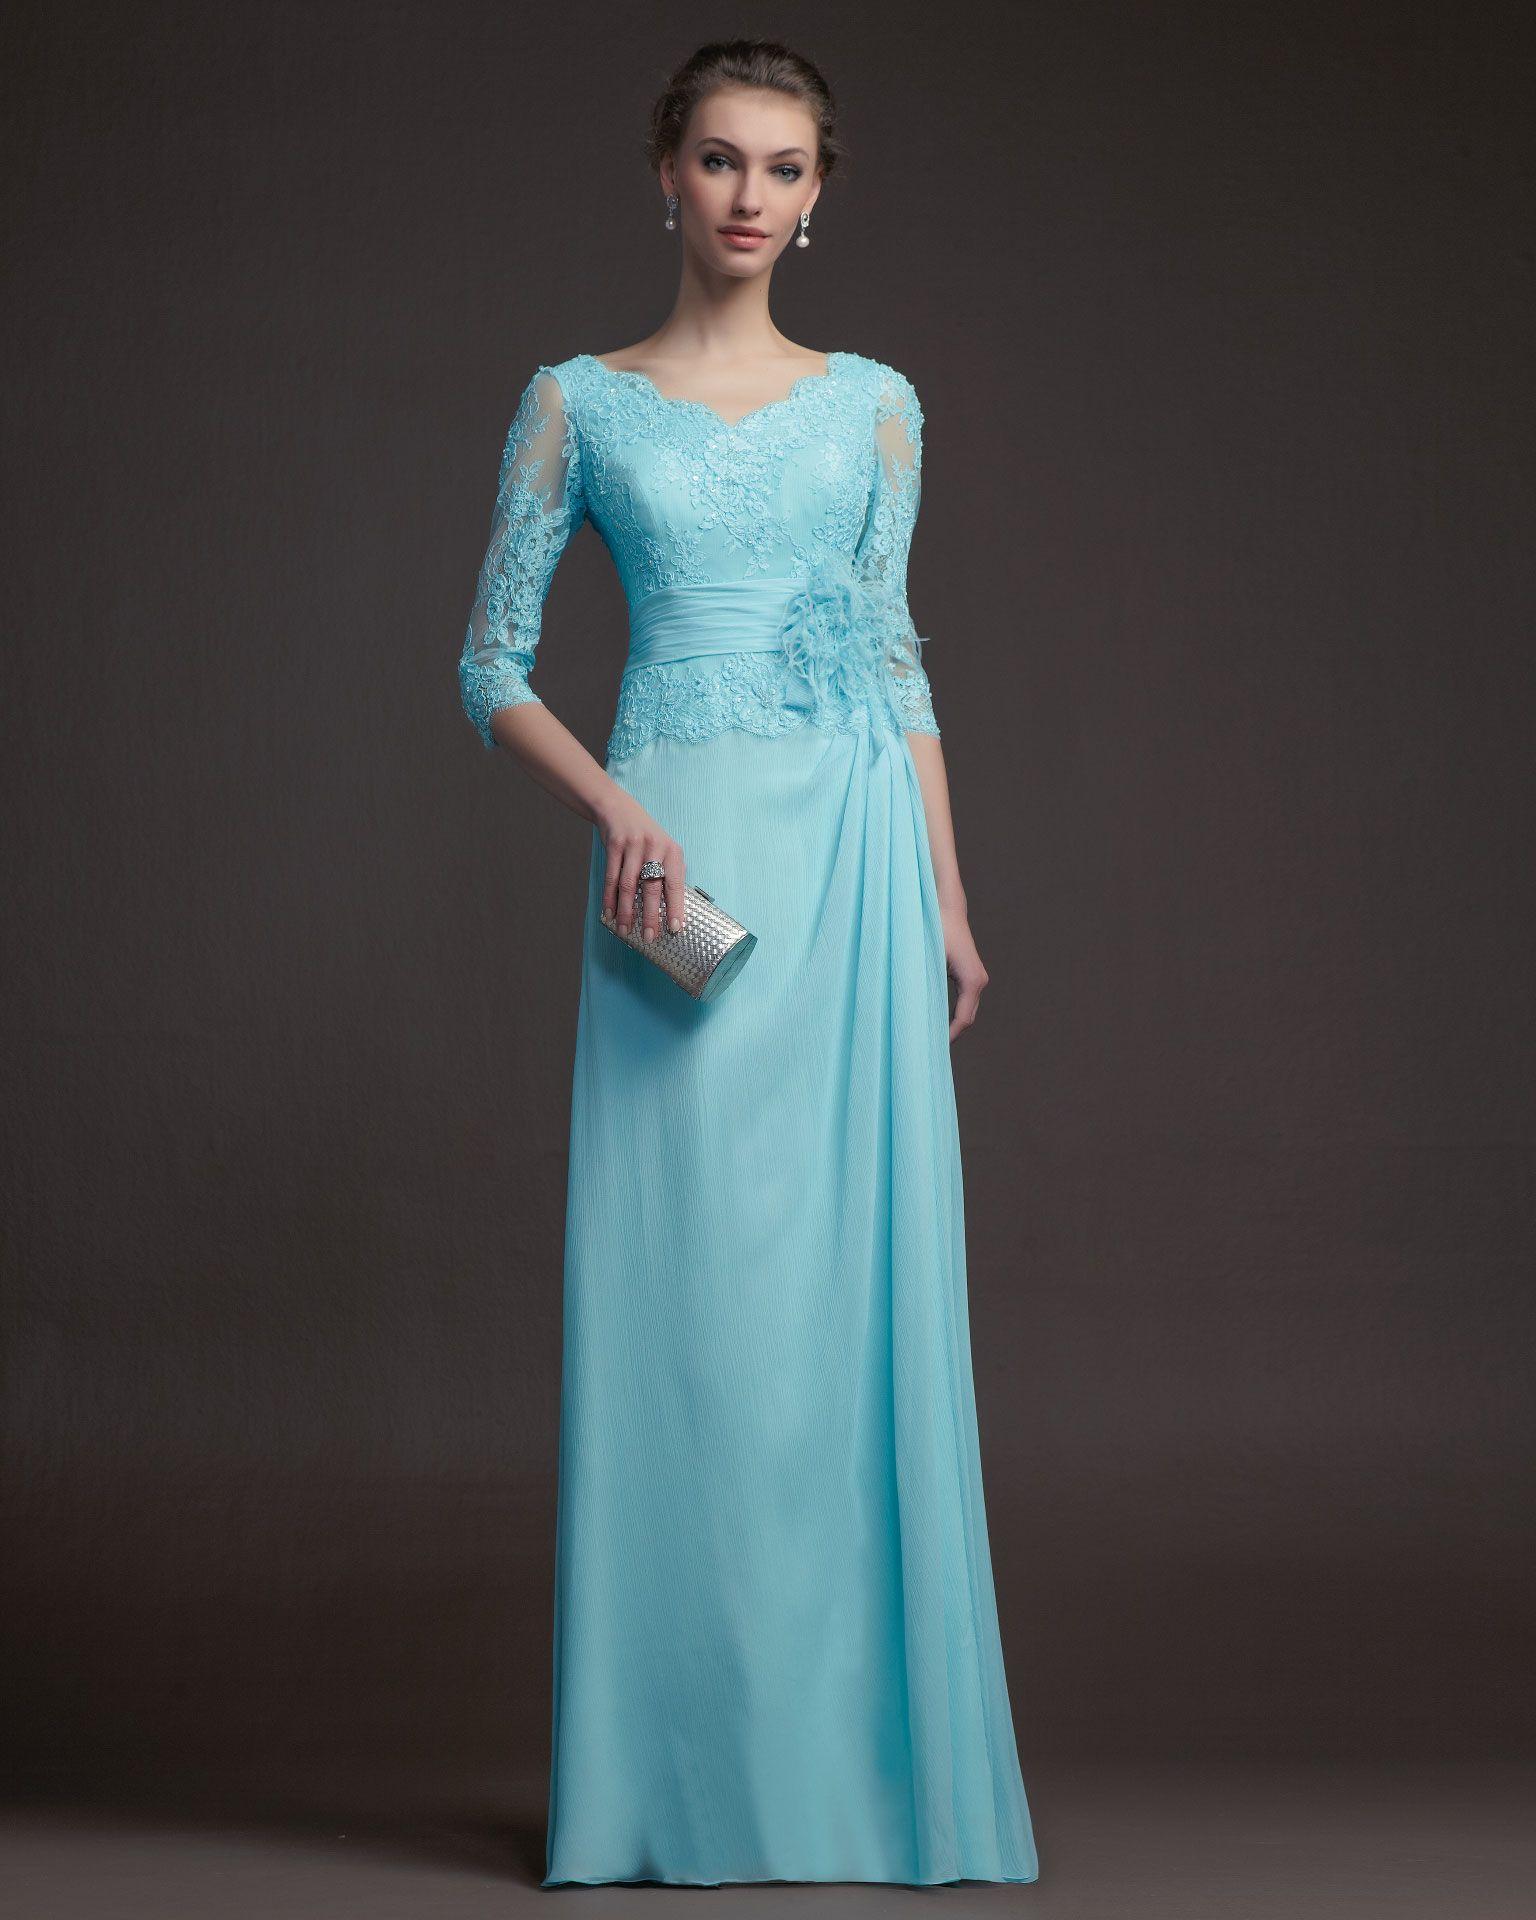 Pin de Catherine Lallouette Sampere en Vestidos de novia | Pinterest ...